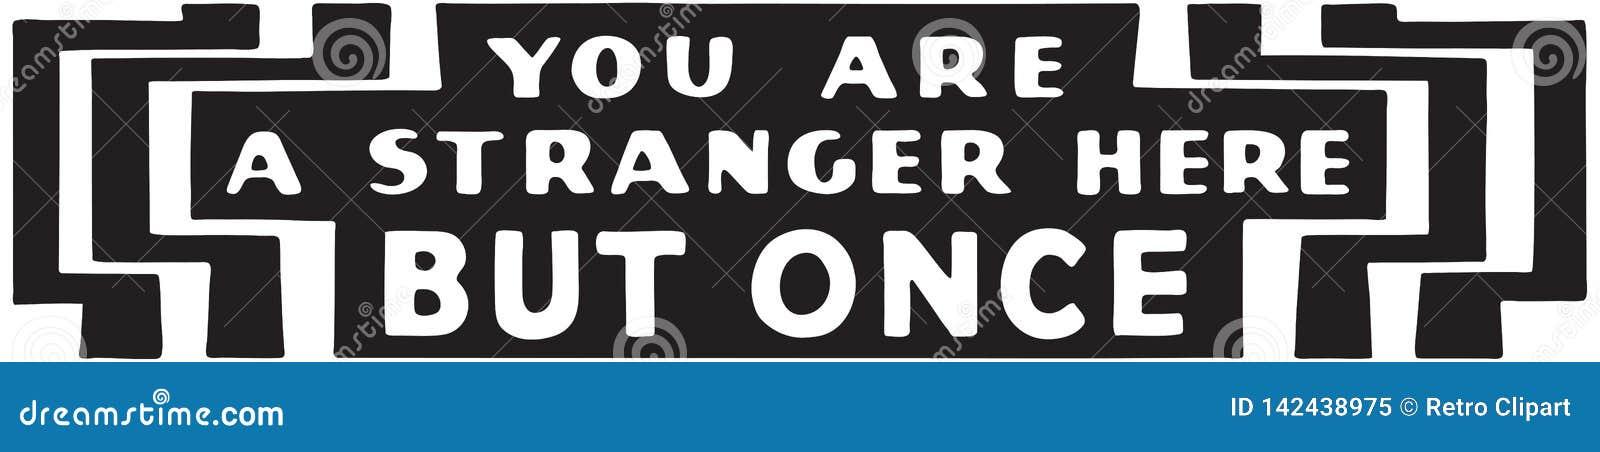 Usted es un extranjero 2